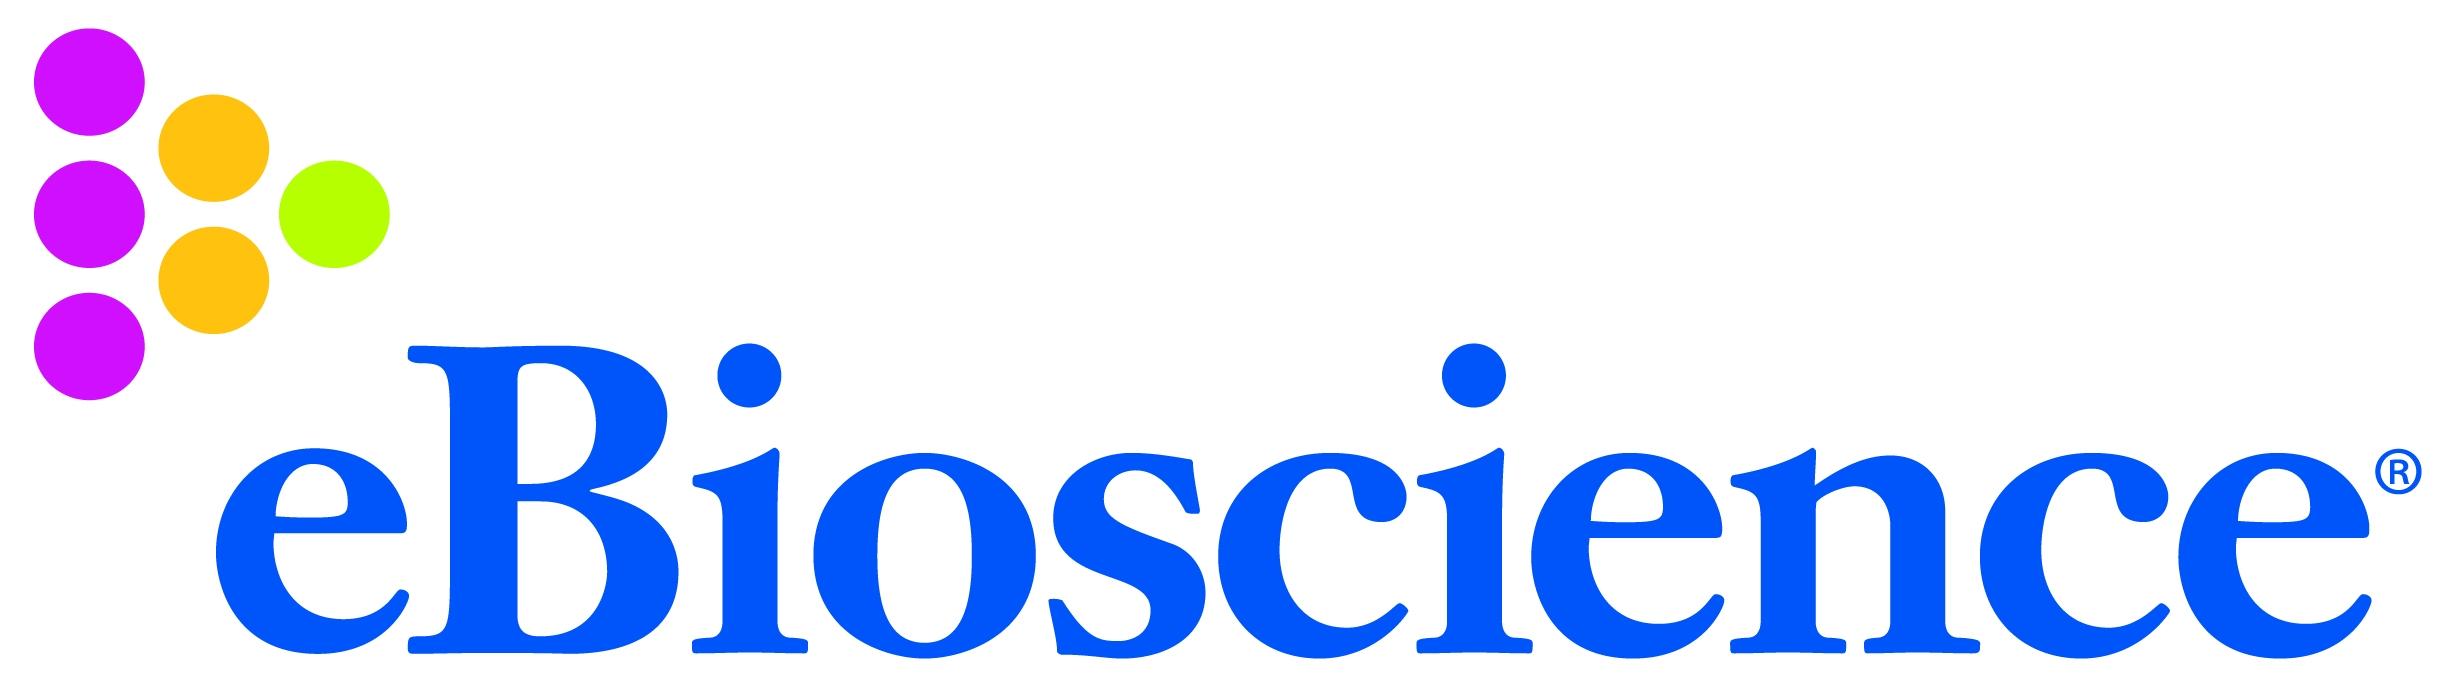 C3 Customer - eBioscience